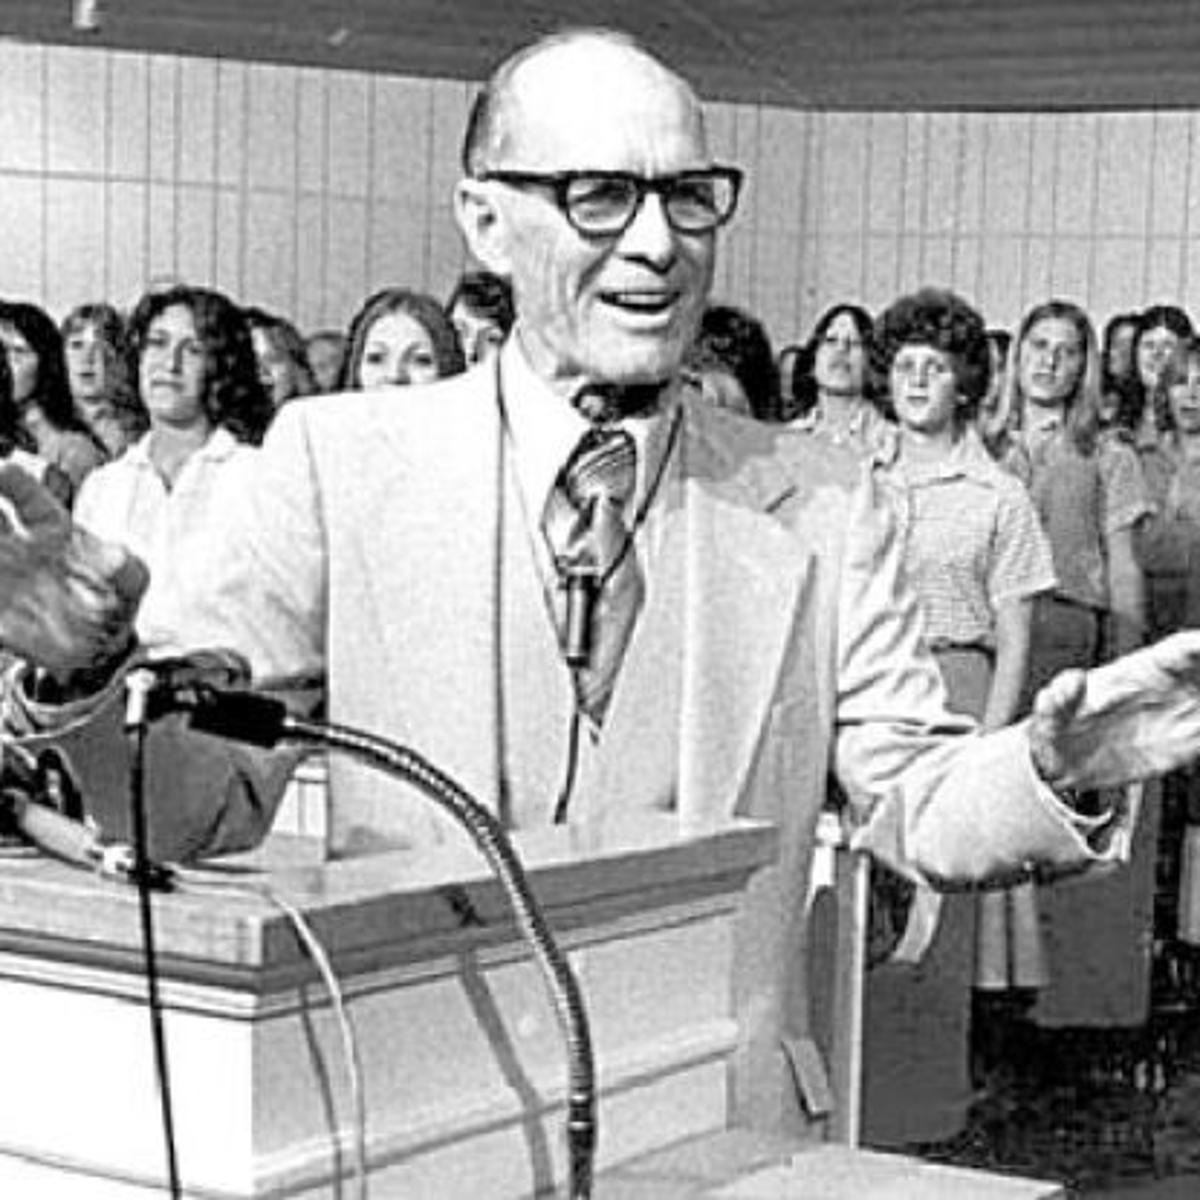 Brazos Past: Sermons by radio preacher Lester Roloff live on